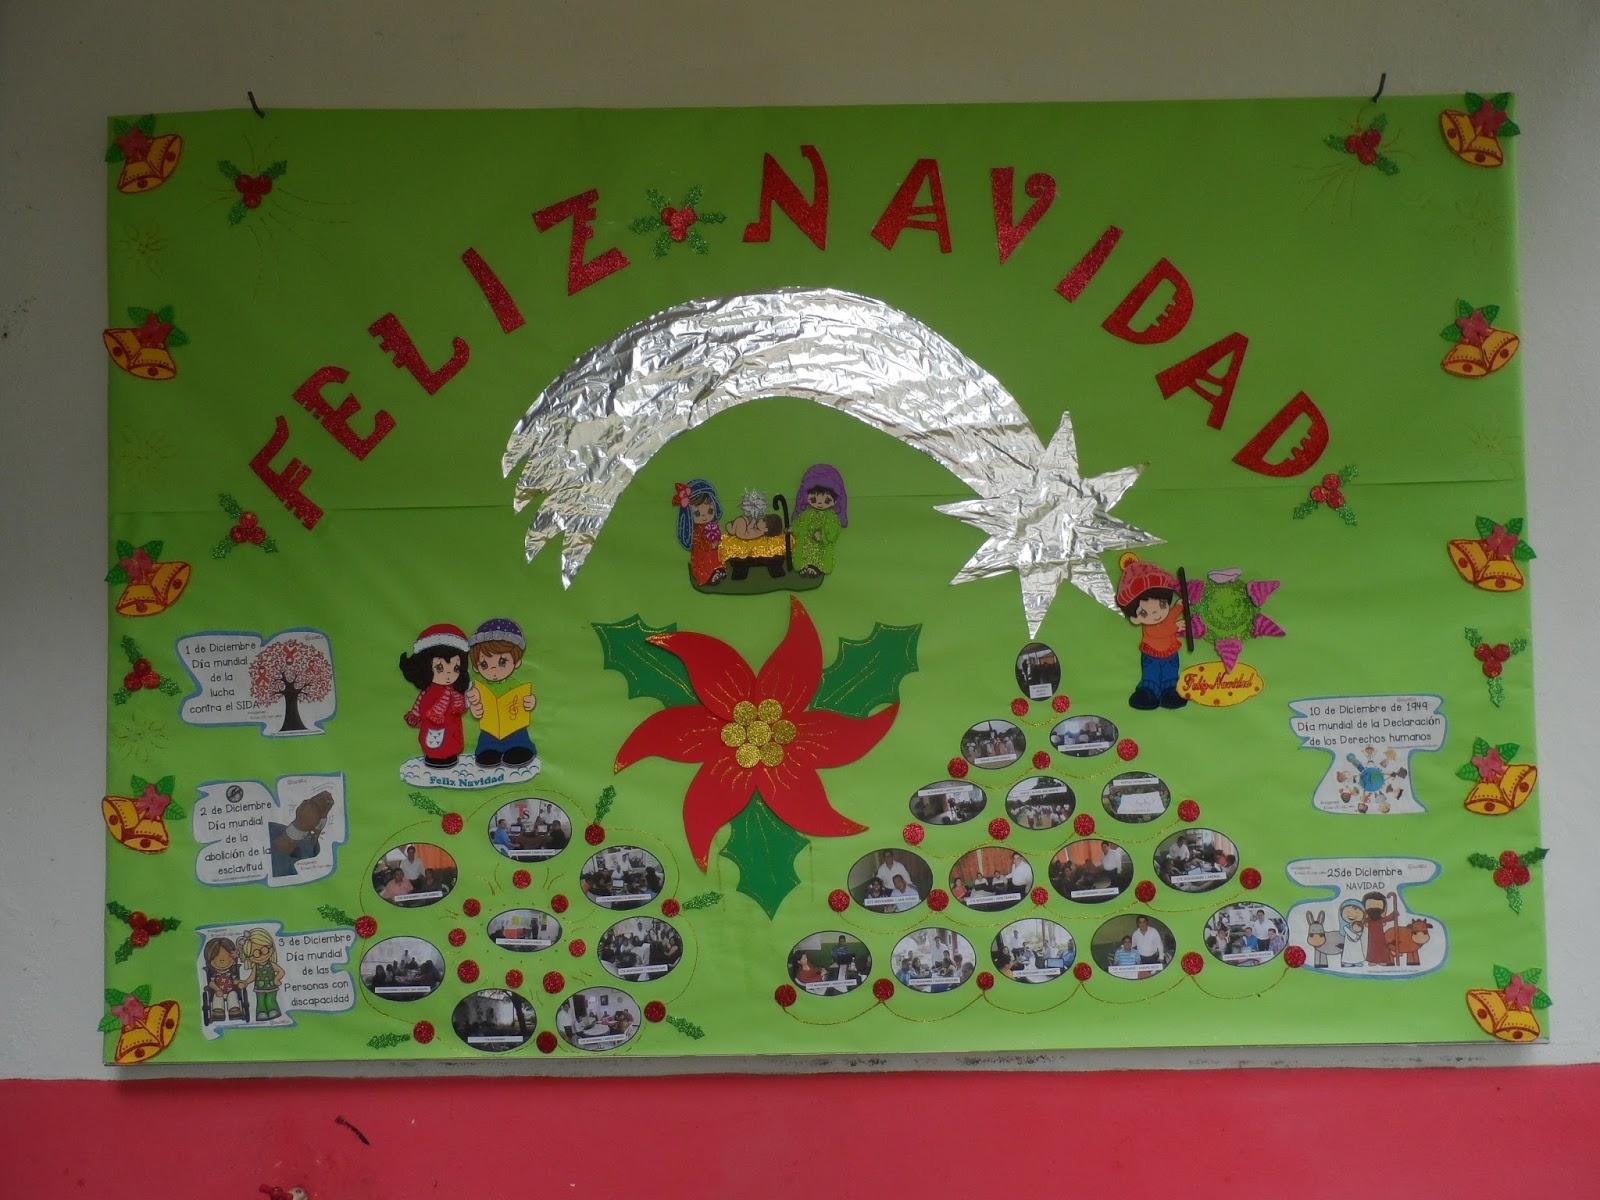 Supervisi n escolar zona 72 telesecundarias playa vicente for Deportes para el periodico mural